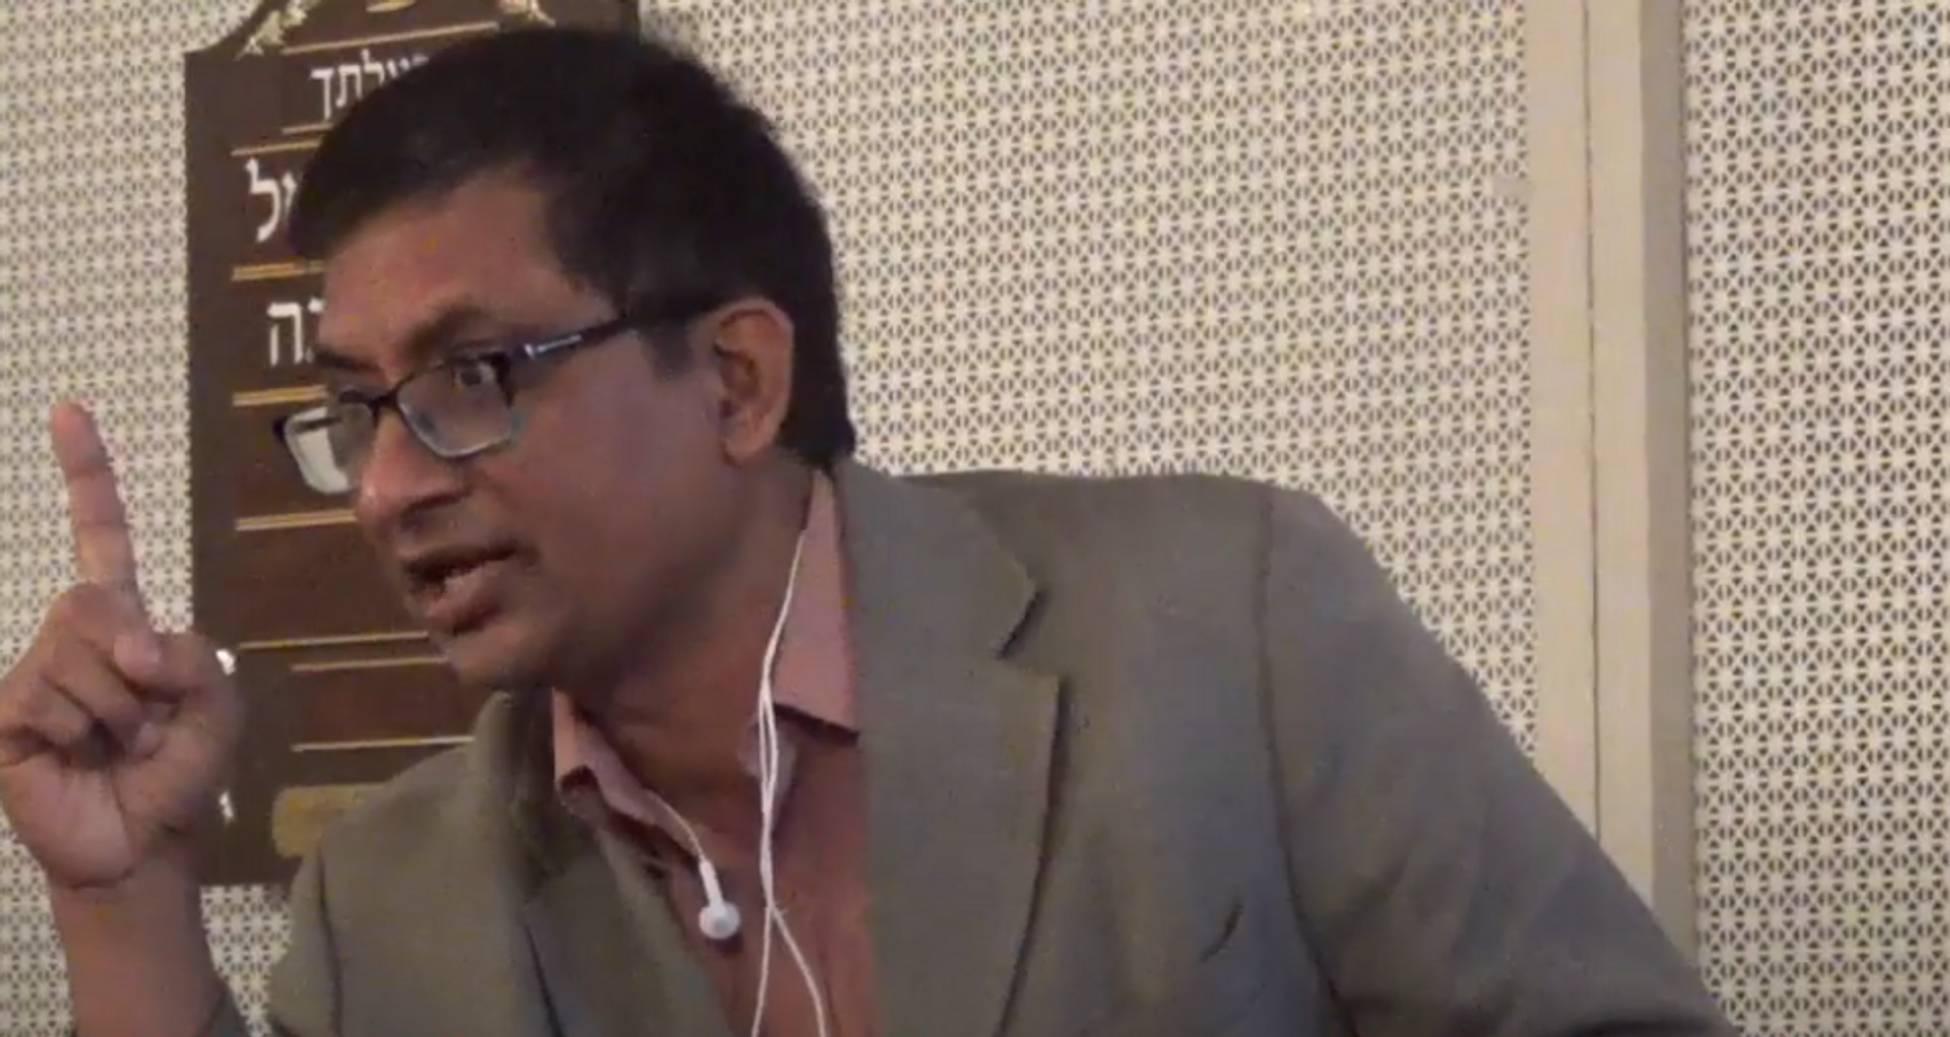 Pro-India E-Zine Run By Canadian Software Engineer Pushes Islamophobic Conspiracy Theories